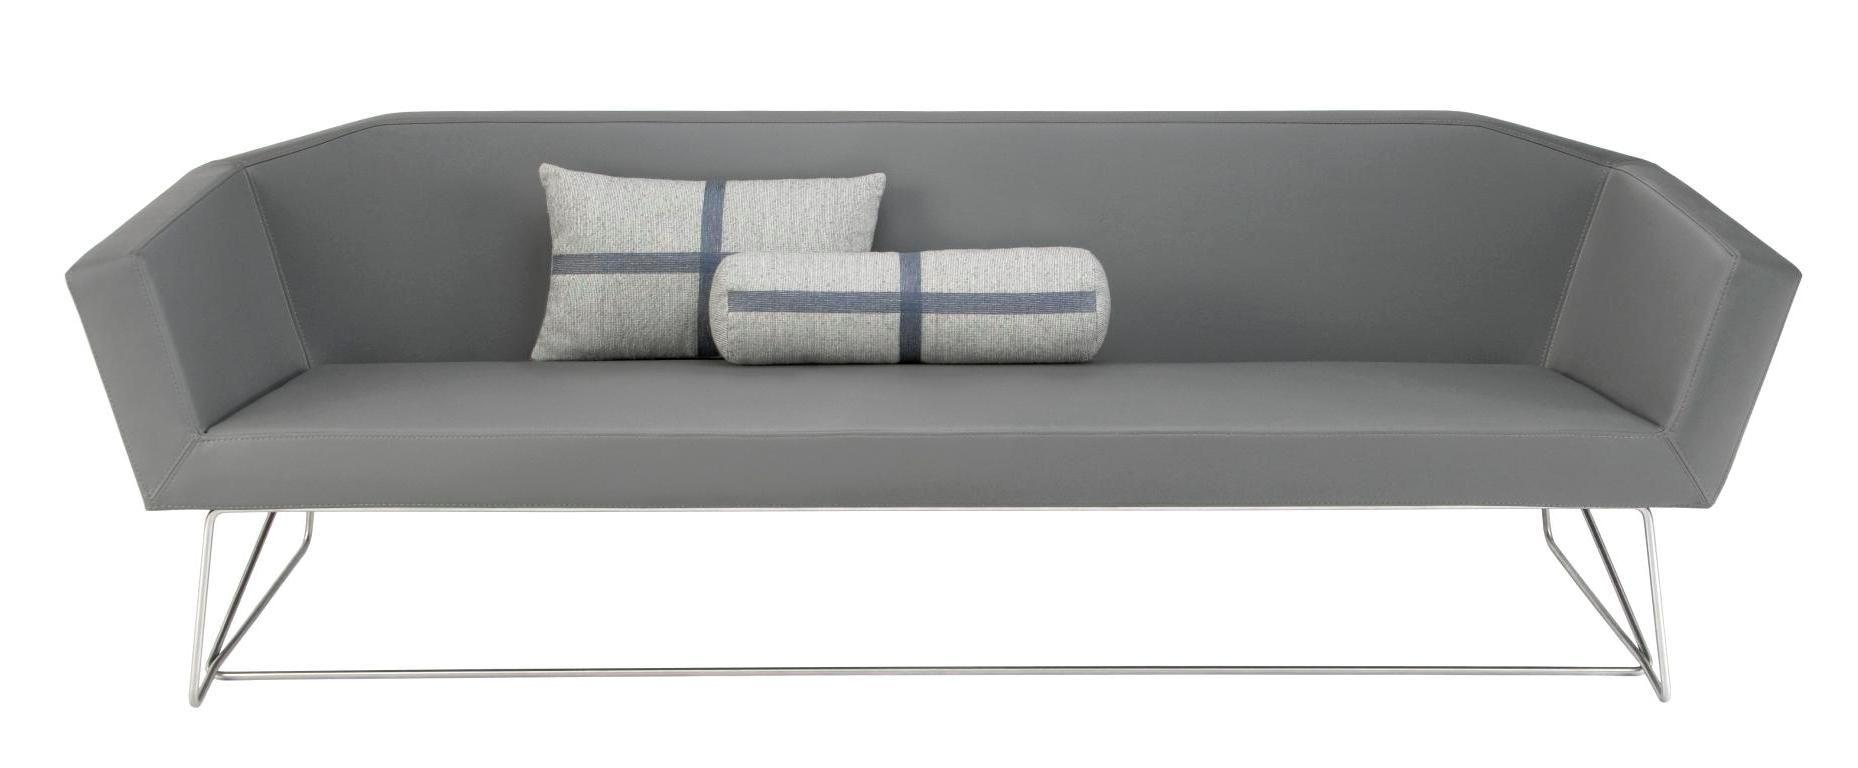 Swept sofa furniture pinterest sofa sleeper minimalist and modern